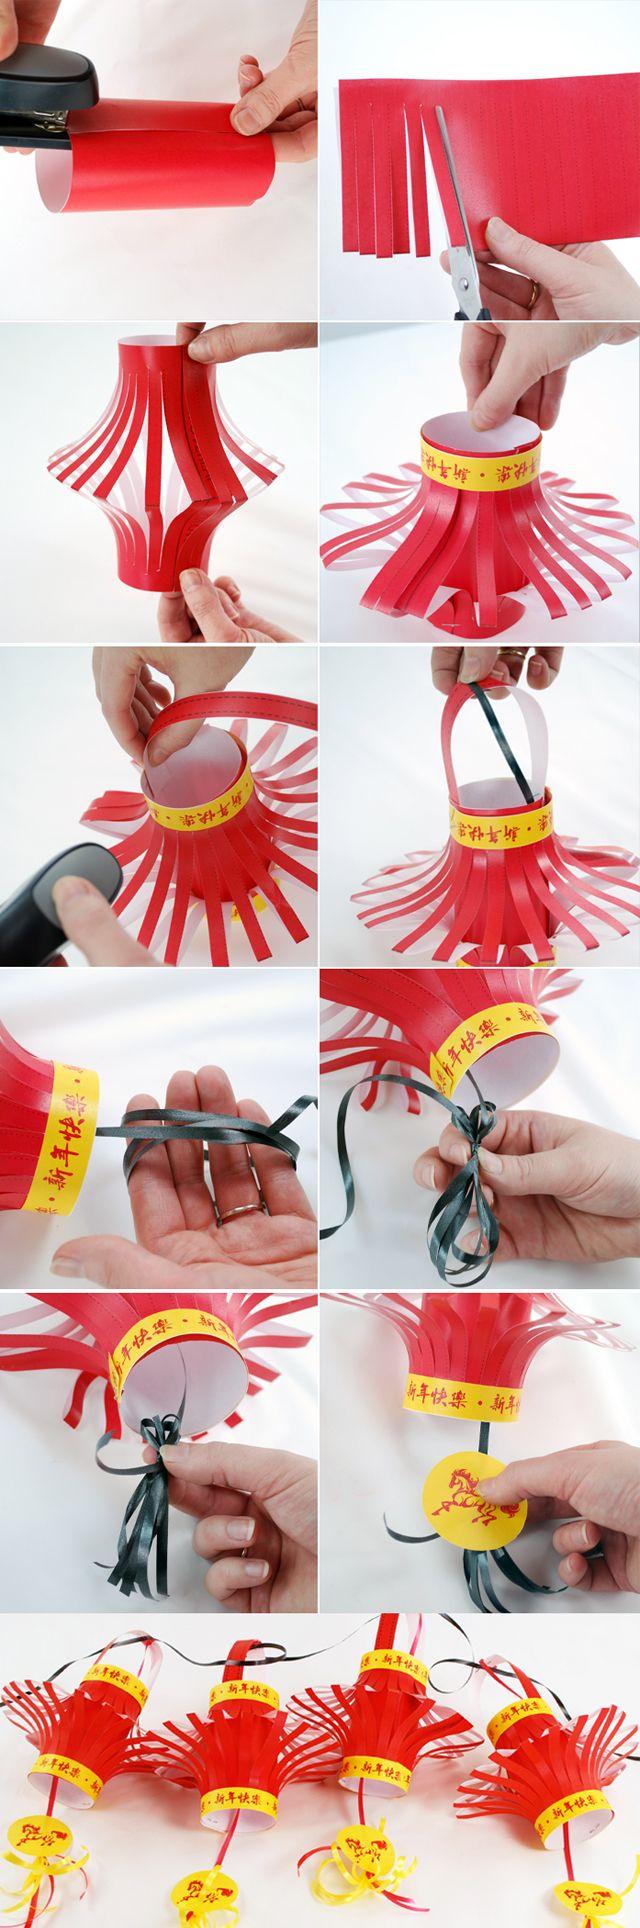 How to Make Chinese Lanterns - Free Printable! #chinesenewyear